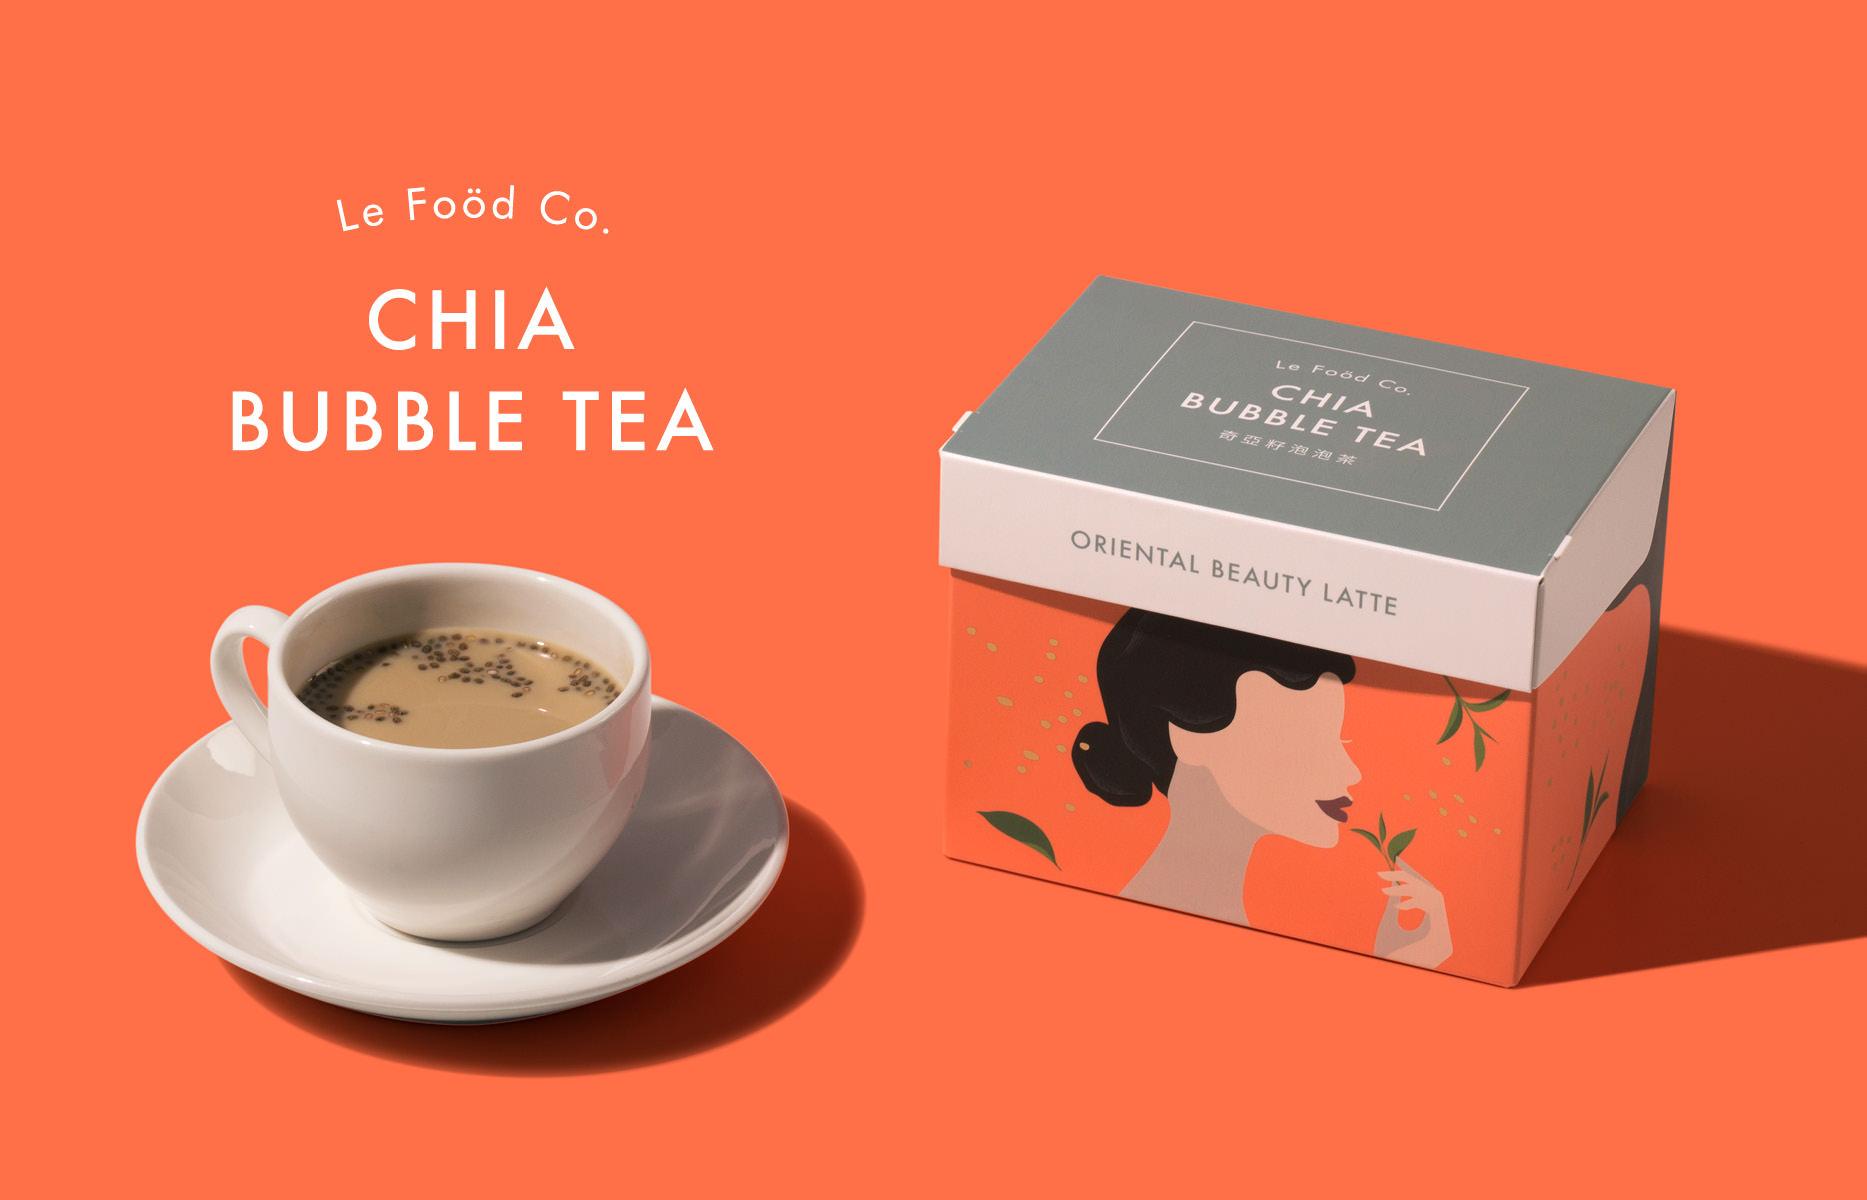 Chia Bubble Tea